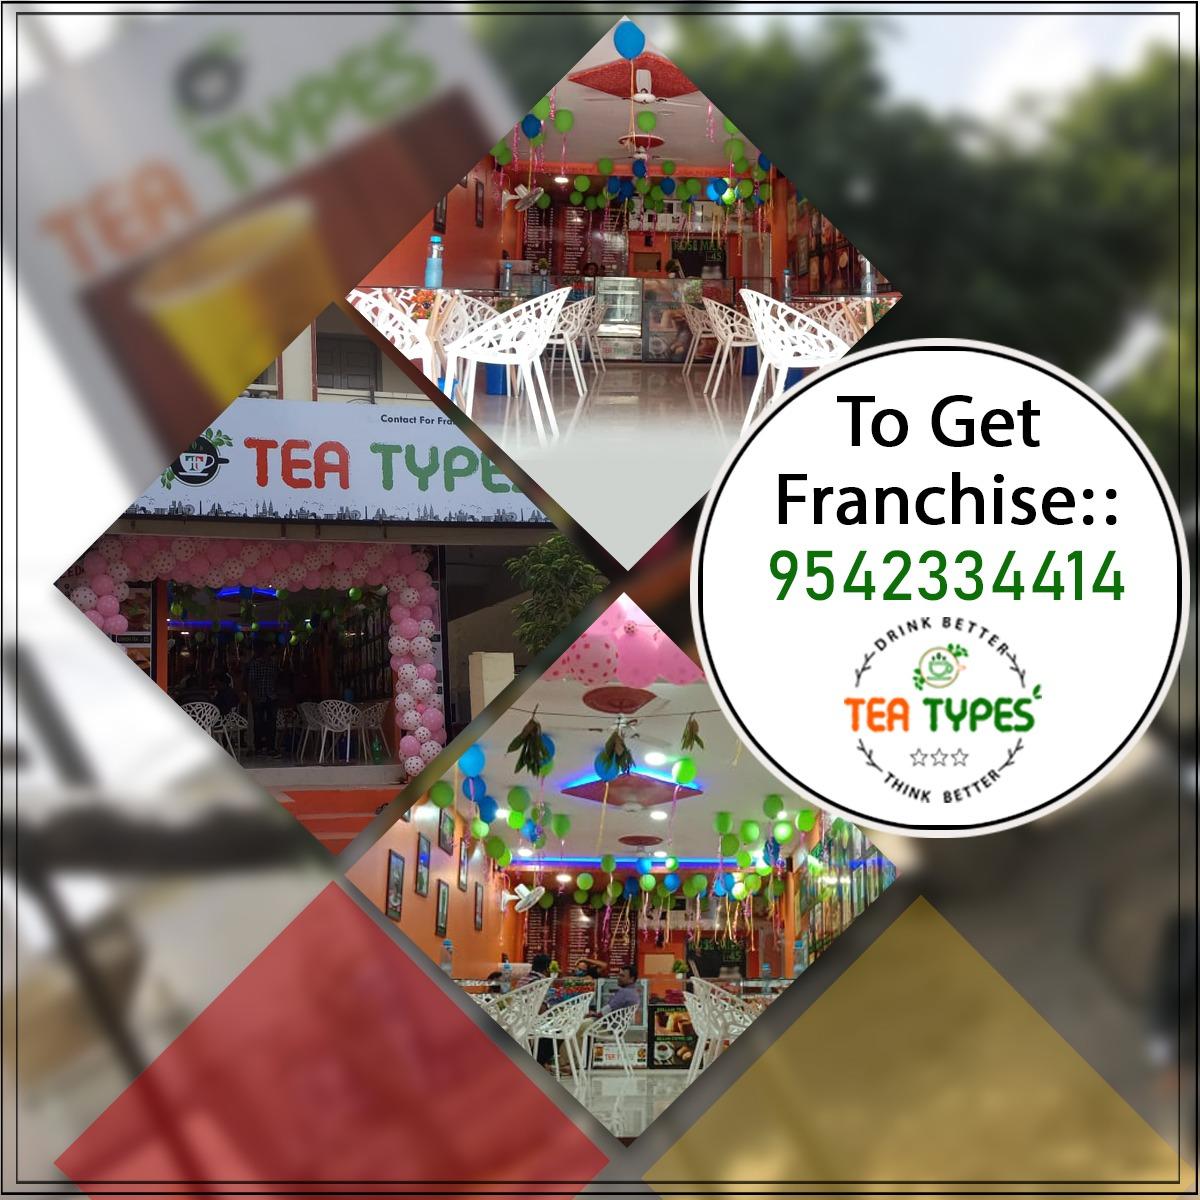 To get Franchise Contact to 095423 34414 #Uniquetaste #Naturalingredients #TeaTypes #cafe #cafestagram #cafelover #teatime #tealovers #teacafe #teatypescafe #grandopening #visakhapatnam #andhrapradesh #organiccoffee #coffeelovers #businessoppartunitypic.twitter.com/FluEY2PI50